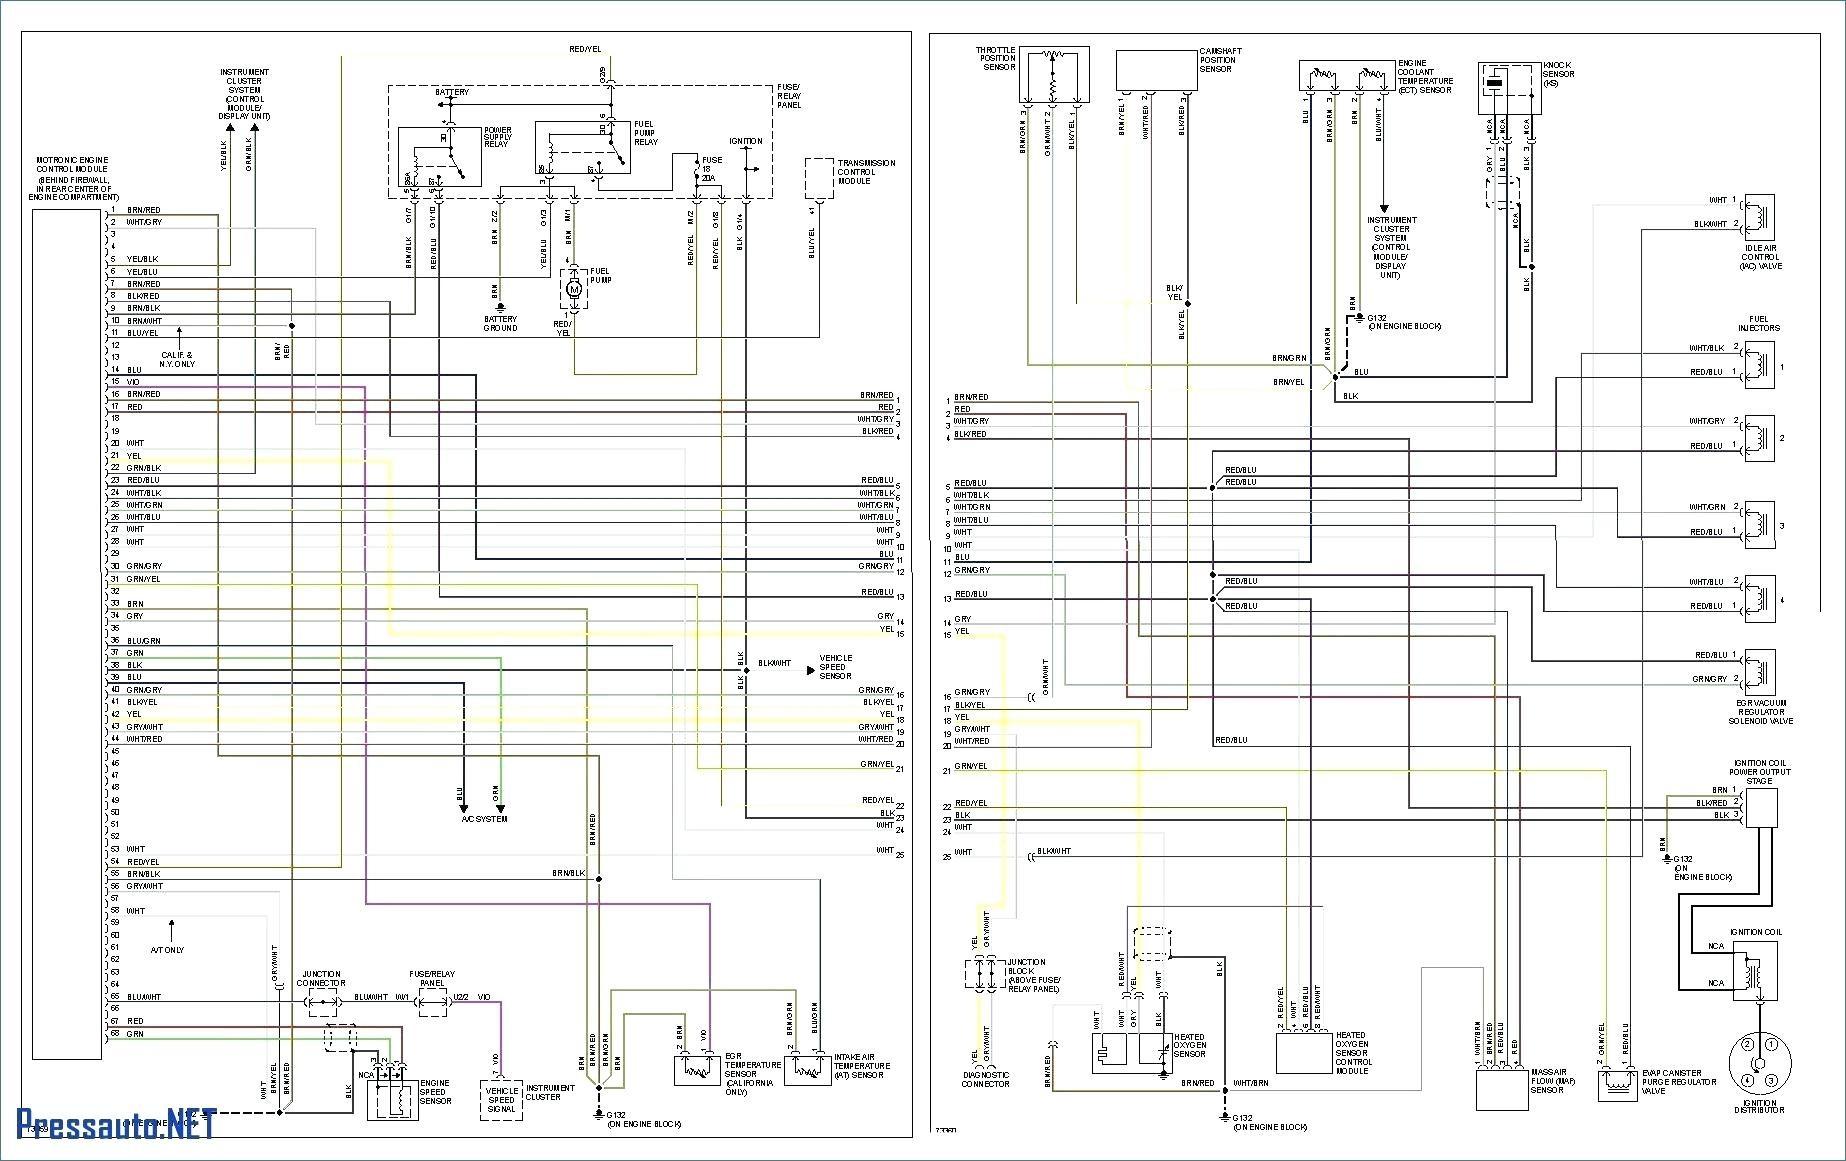 2006 Vw Jetta Radio Wiring Diagram 2000 Vw Jetta Vr6 Fuse Box Diagram Radio Wiring Tdi Location Of 2006 Vw Jetta Radio Wiring Diagram